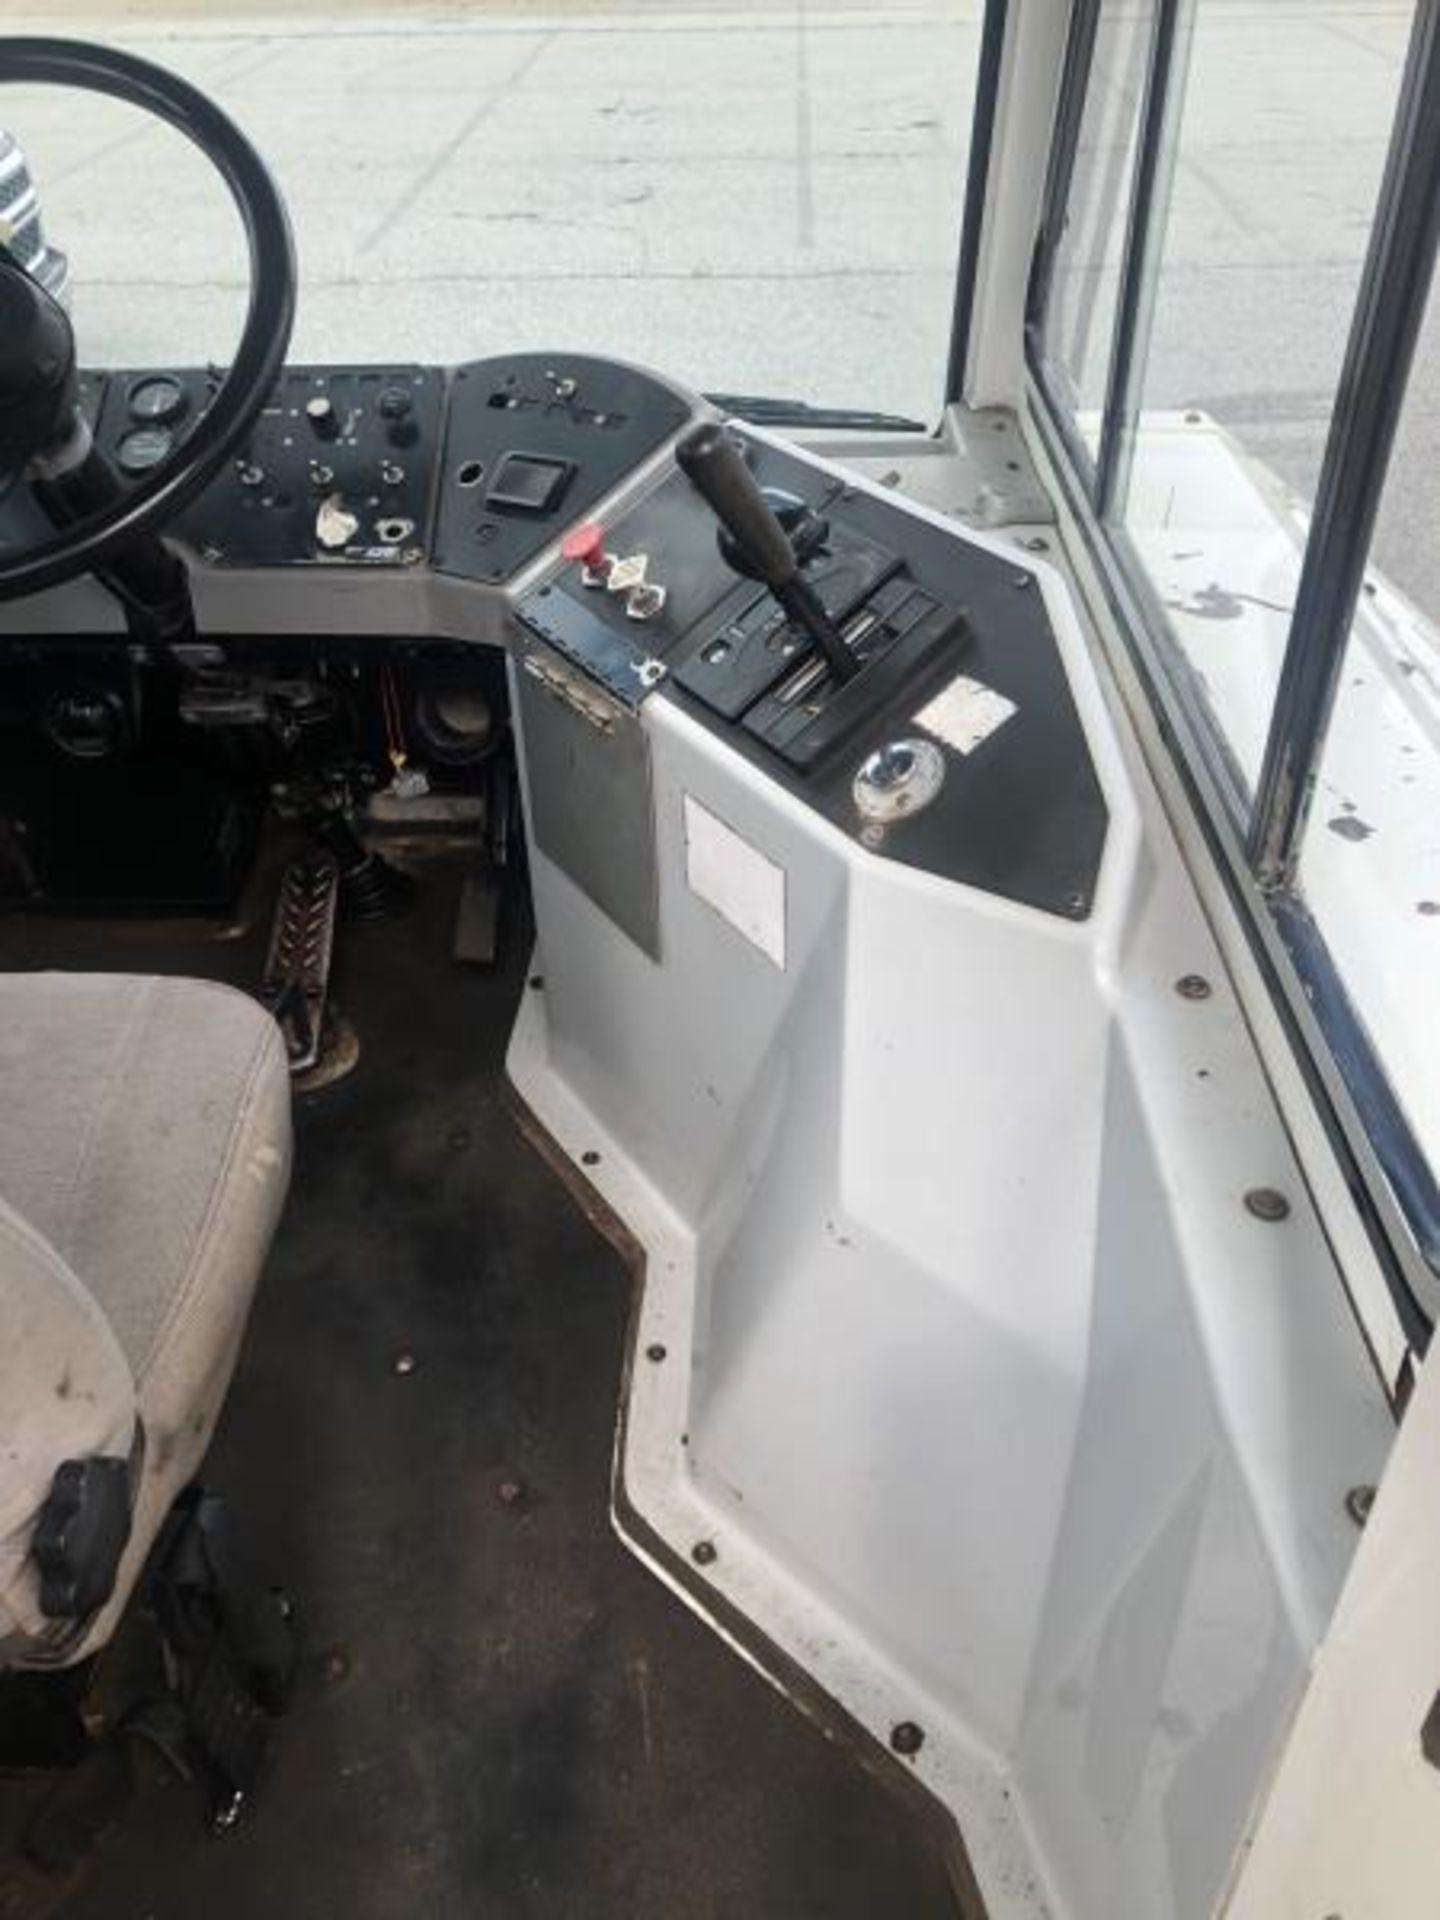 2015 Kalmar Ottawa 4x2 Yard Truck , SN: 338845 2,600.5 Hours, 185 Miles - Image 24 of 27